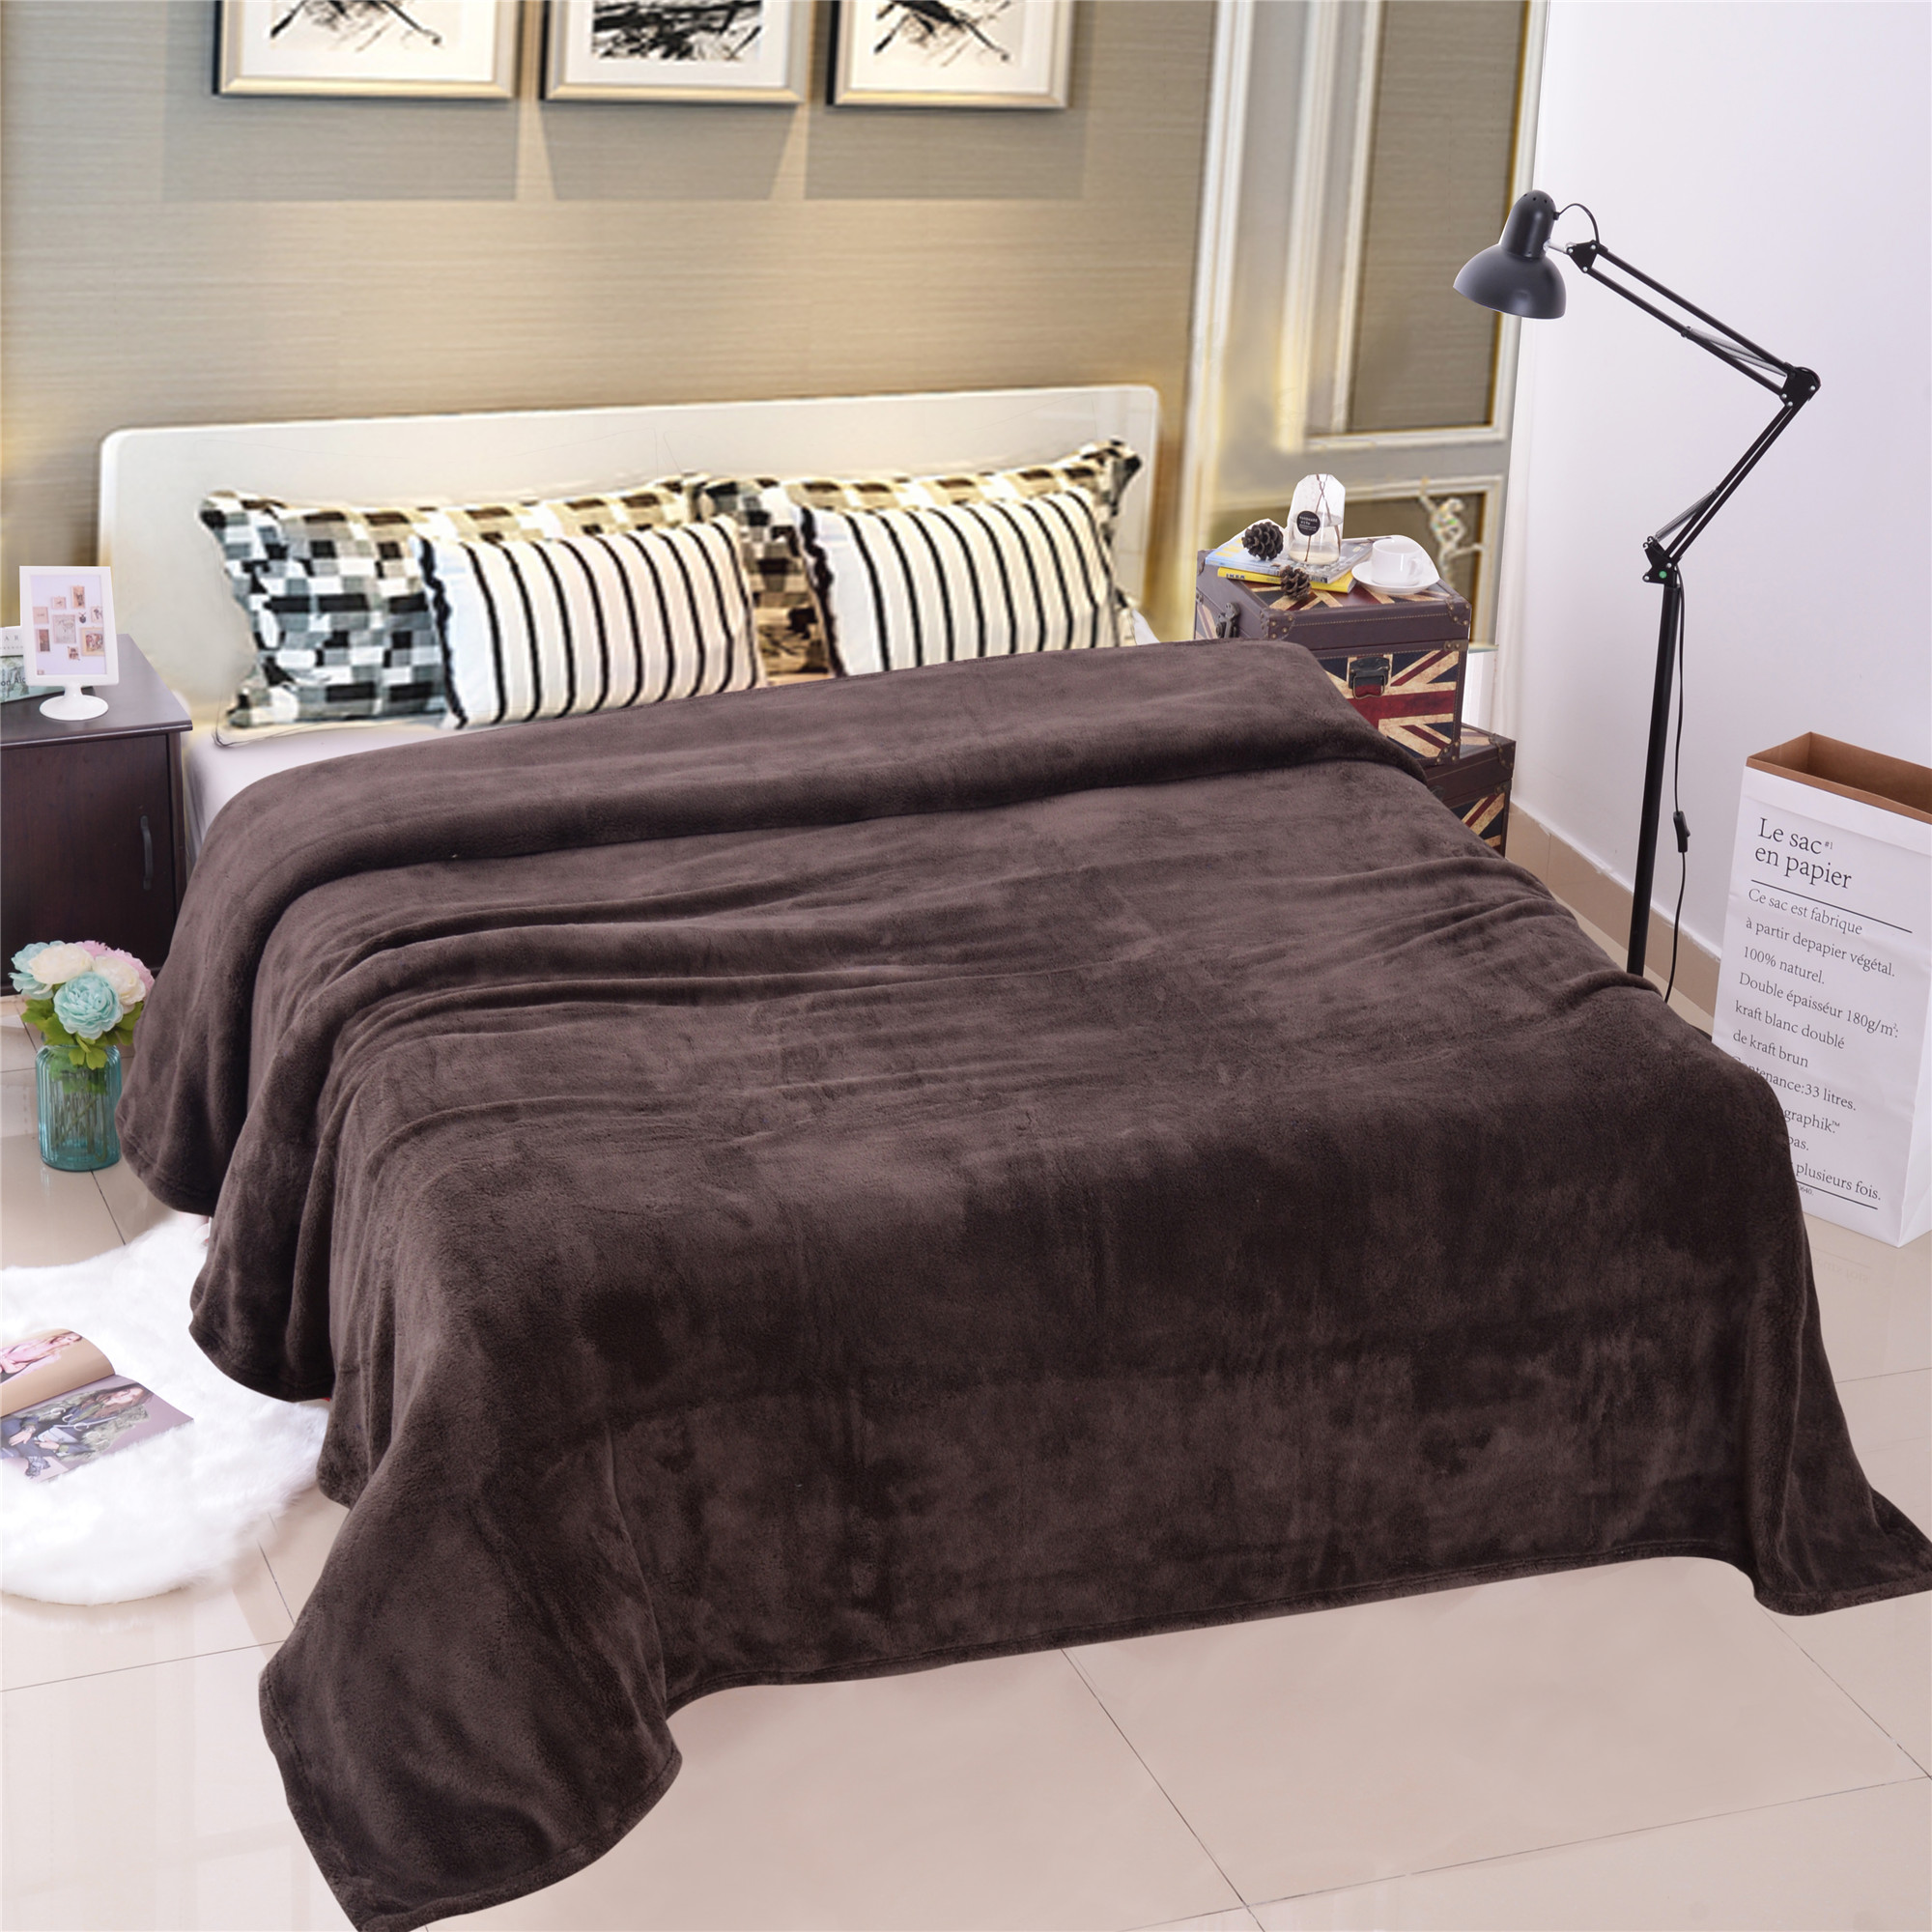 Bedroom Plush Fleece Throw Blanket Solid Brown Printed Warm Fleece Blanket For Sofa Couch... by JML